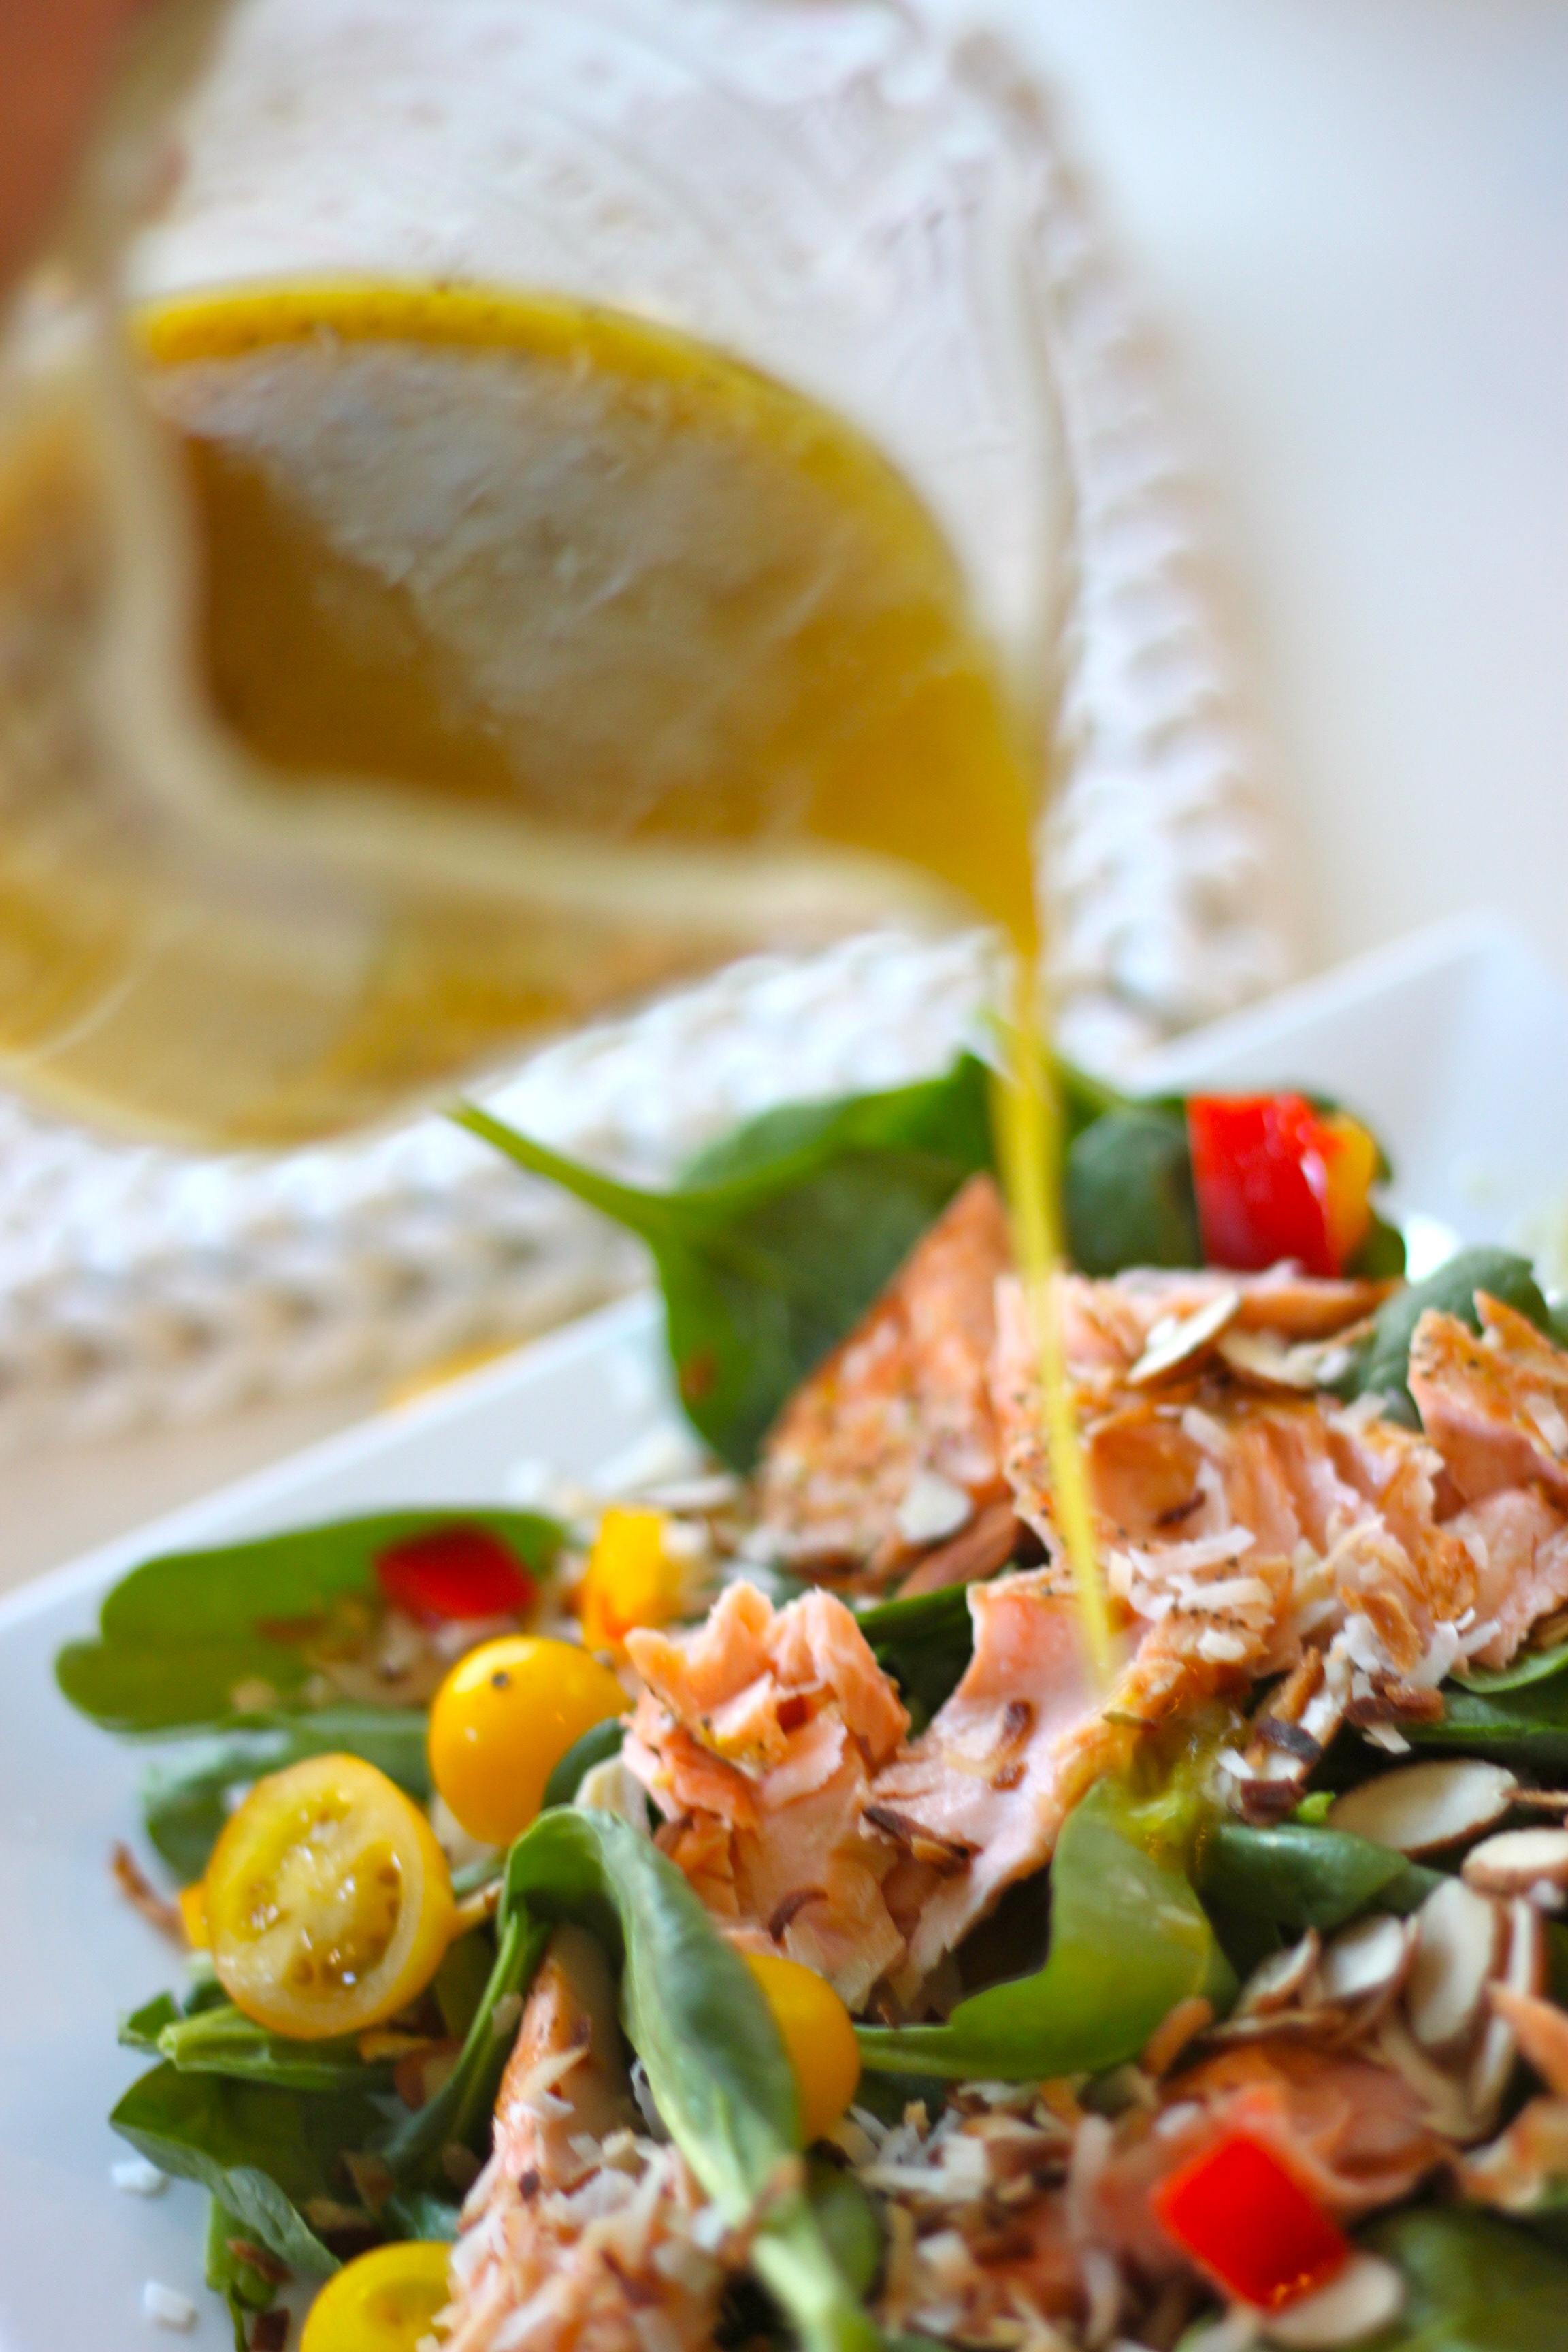 Summer Salmon Salad with Honey Dijon Dressing